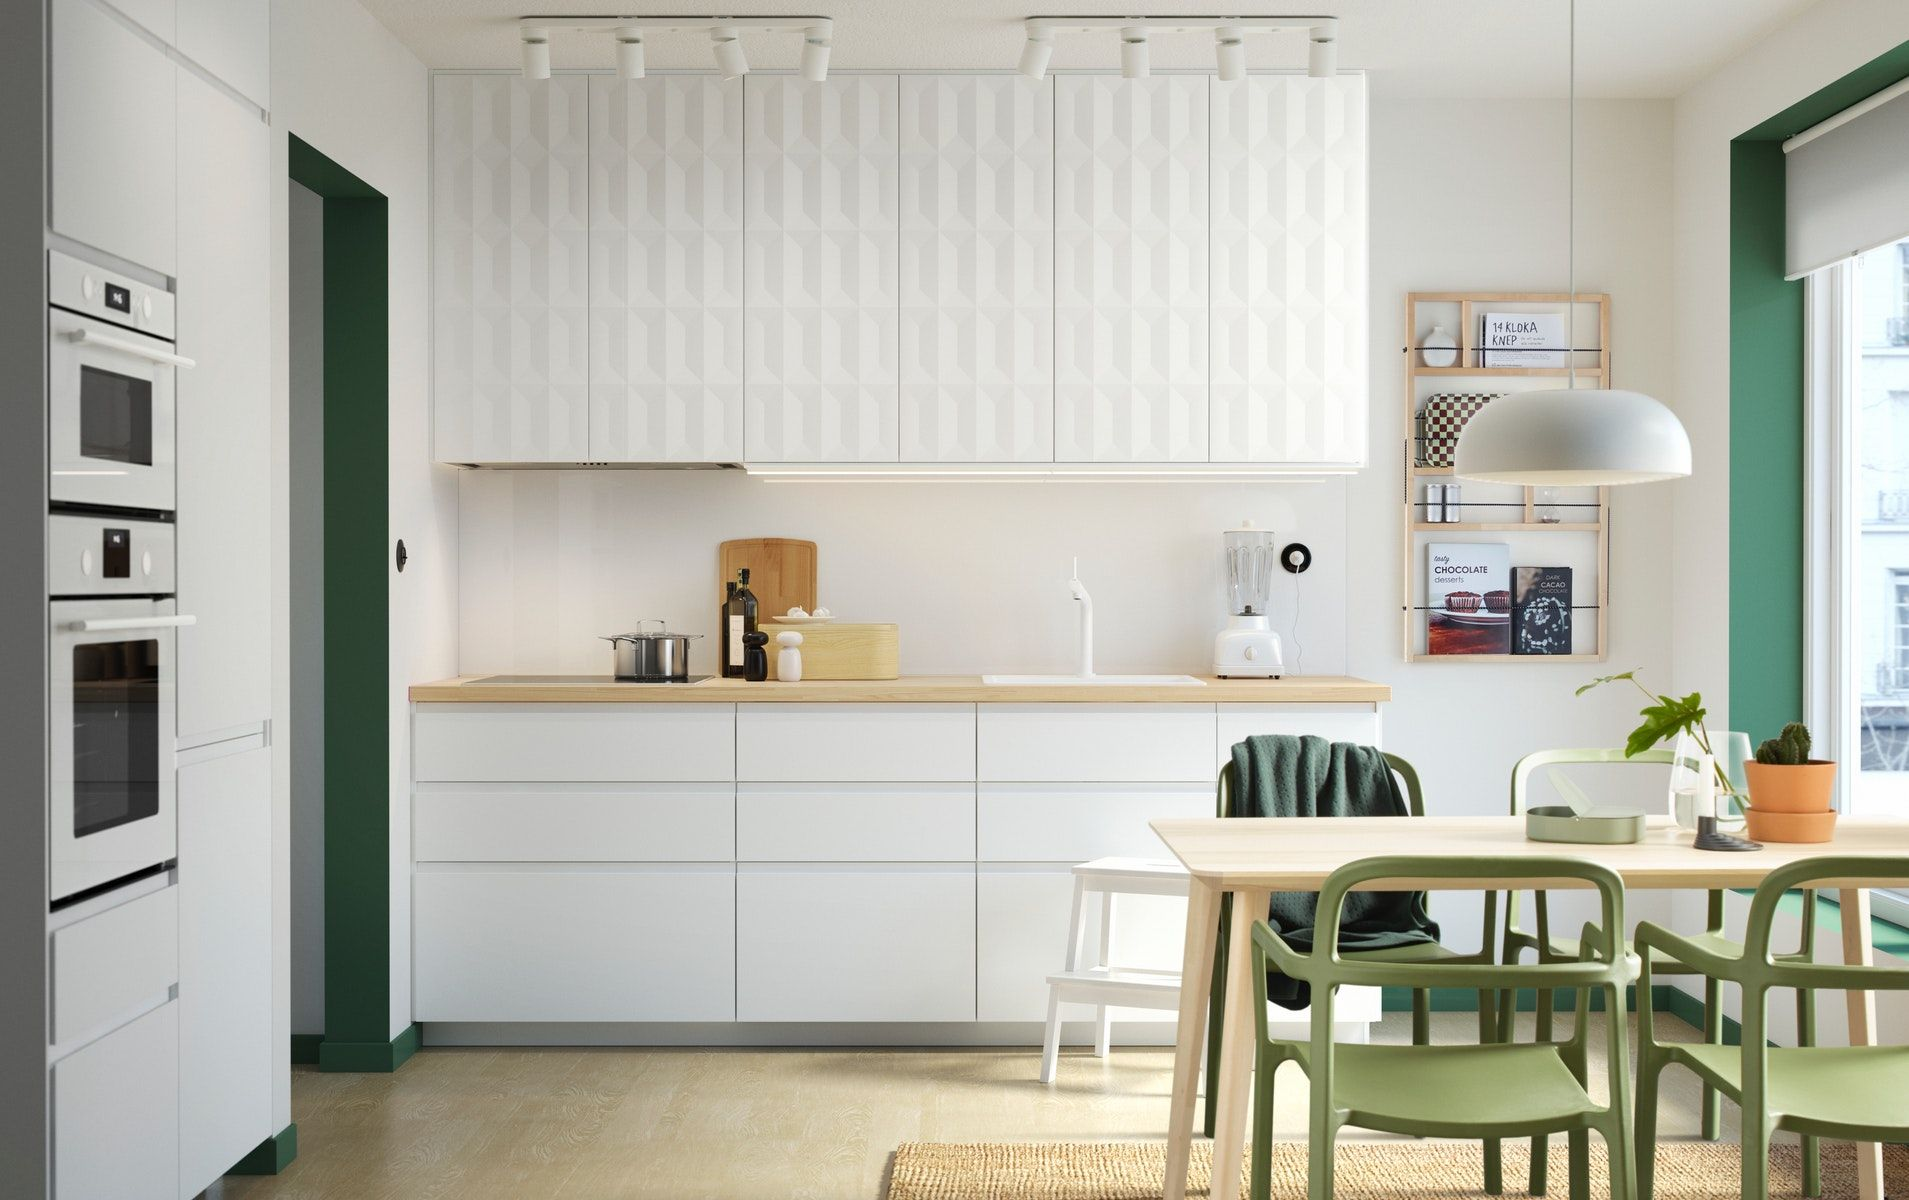 IKEA compact kitchen unit